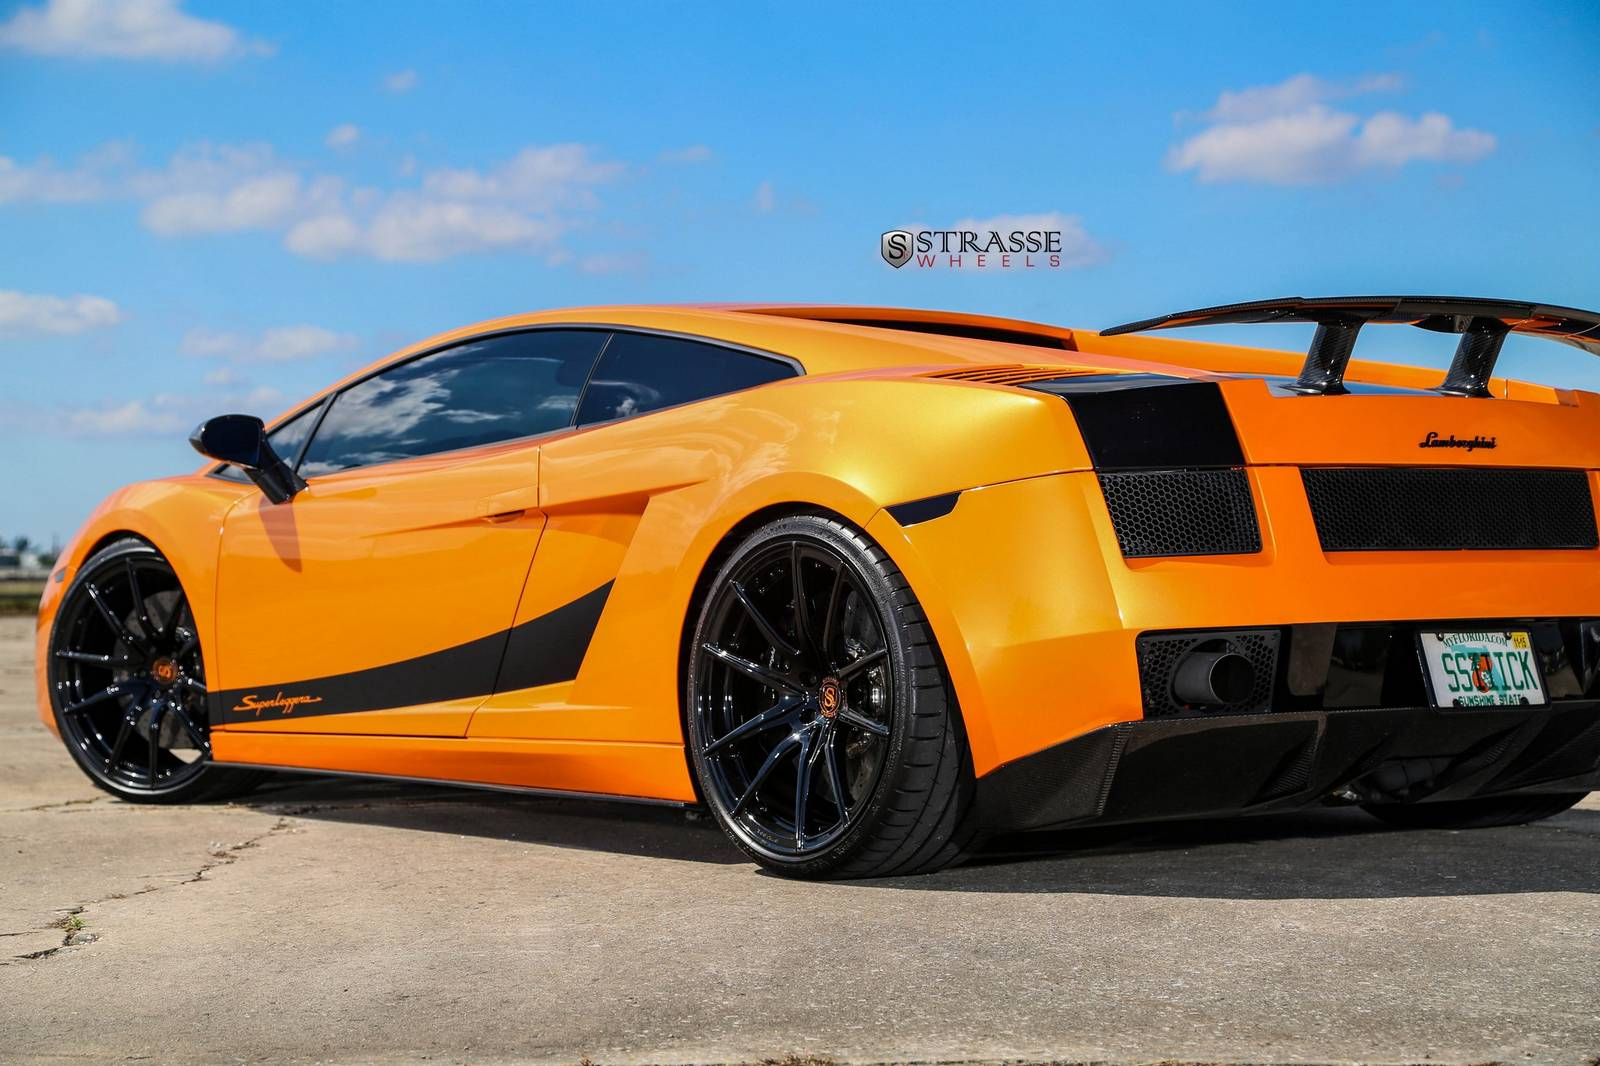 Arancio Borealis Lamborghini Gallardo Superleggera With Strasse Wheels